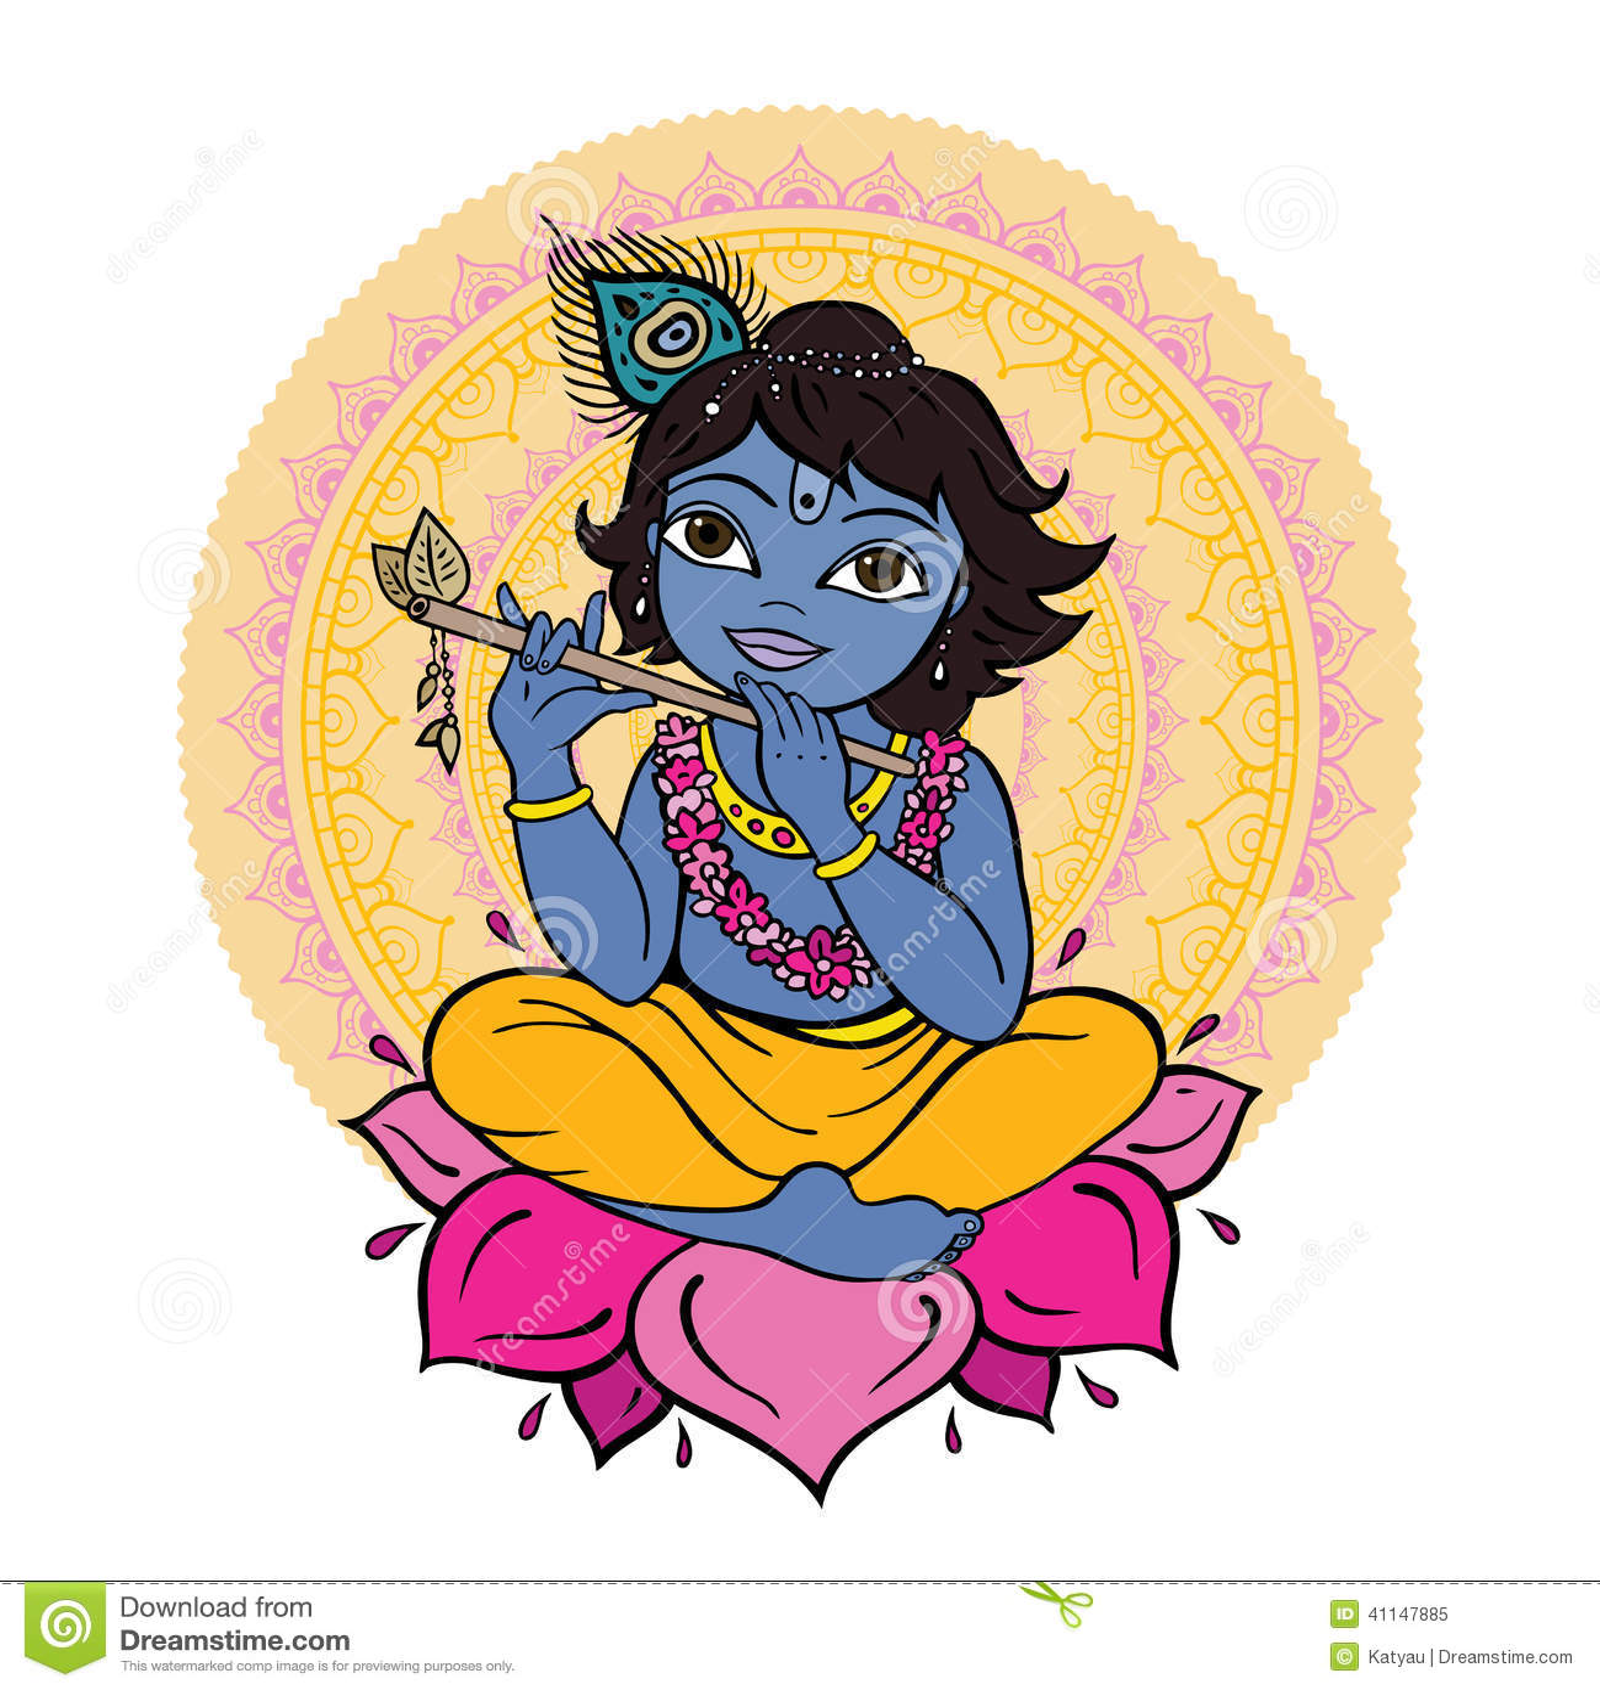 clipart of lord krishna - photo #13